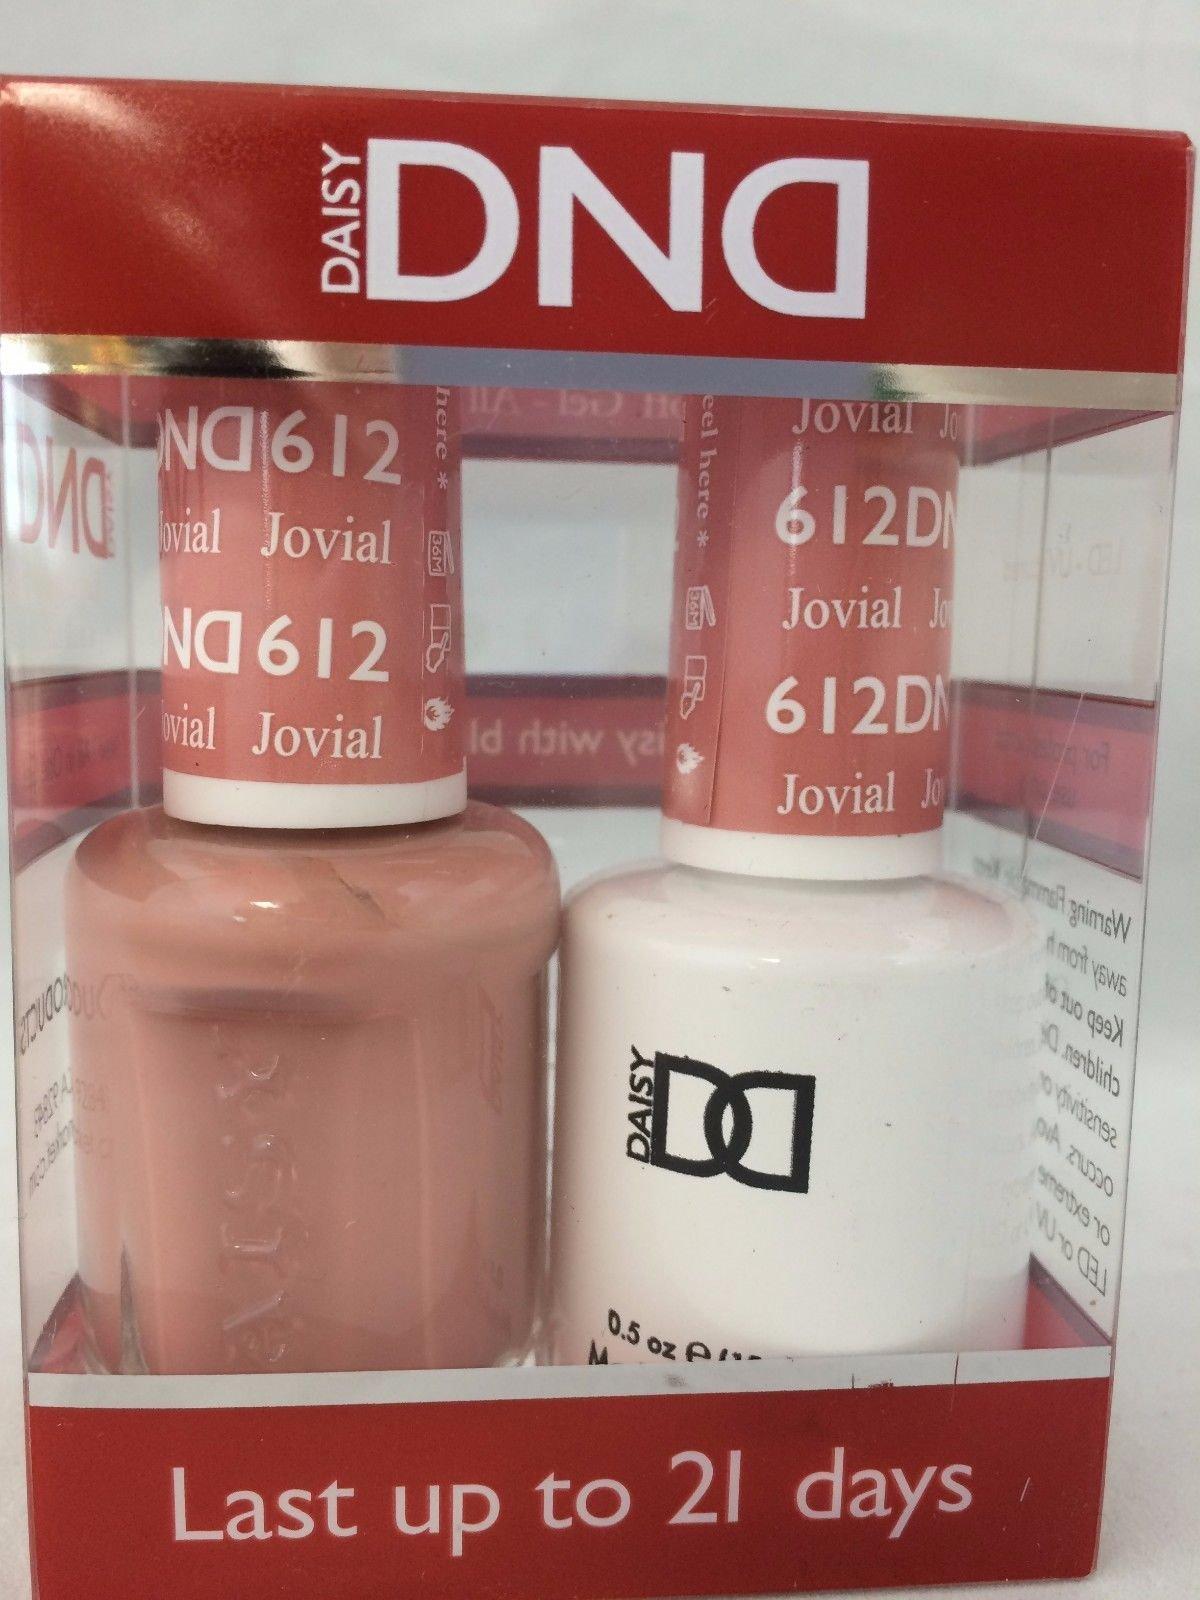 Amazon.com : DND DAISY GEL UV NAIL POLISH - DUO SET(Gel + Lacquer ...